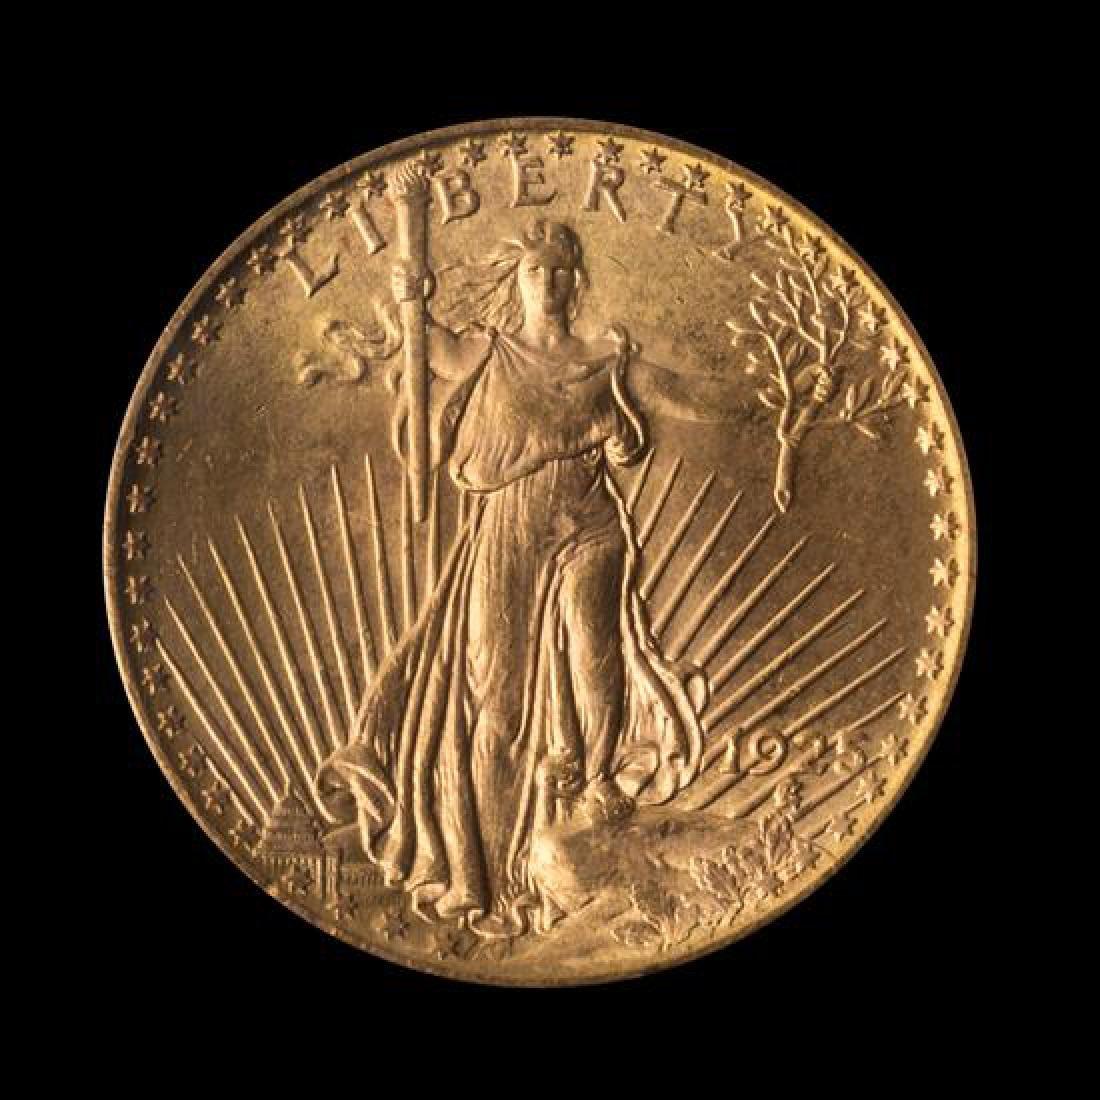 A United States 1925 Saint-Gaudens $20 Gold Coin